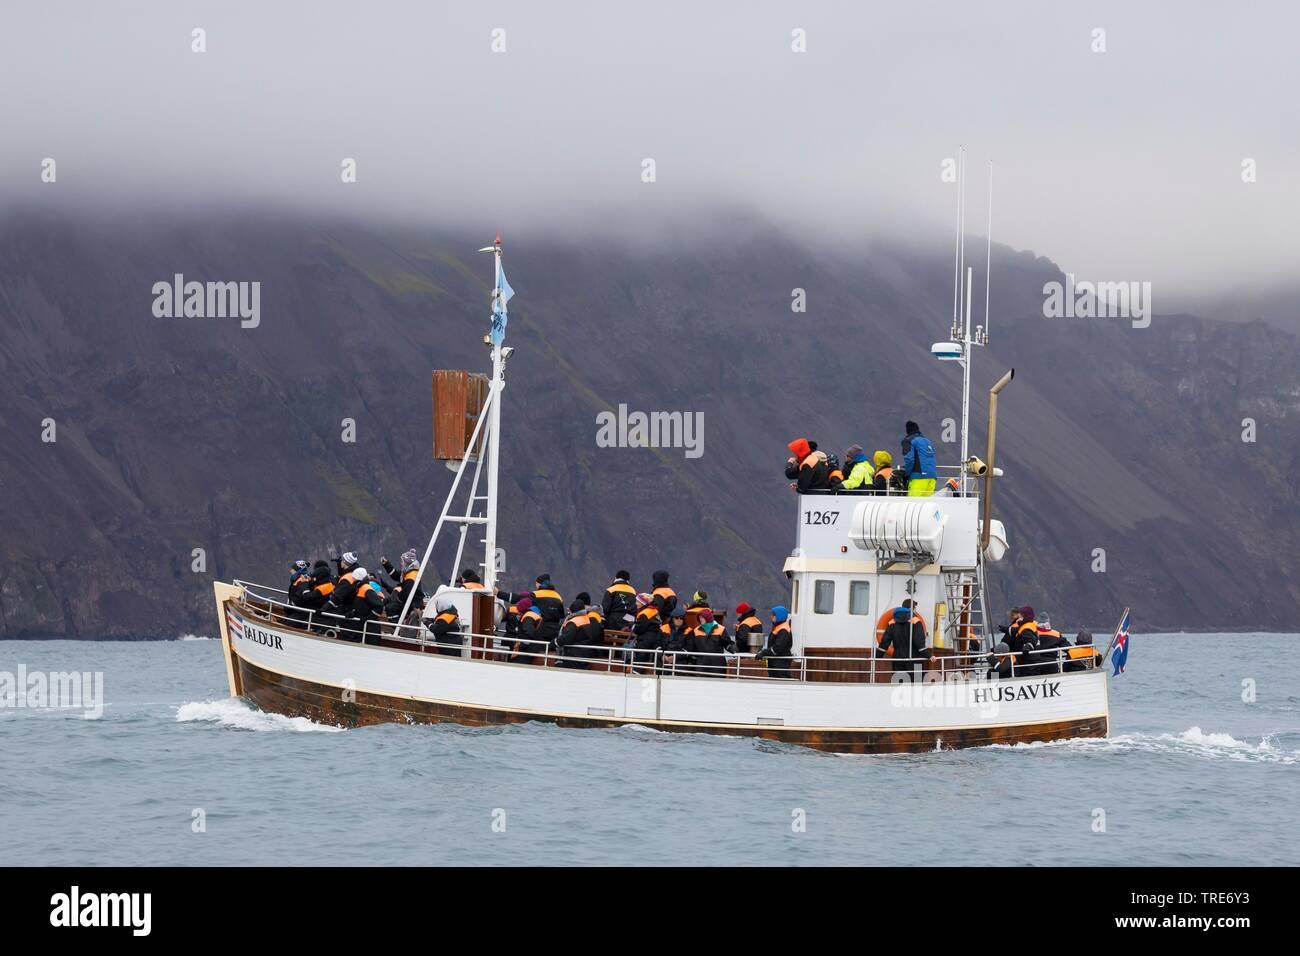 Walbeobachtung, Island, Husavik | whale watching, Iceland, Husavik | BLWS518842.jpg [ (c) blickwinkel/F. Hecker Tel. +49 (0)2302-2793220, E-mail: info - Stock Image